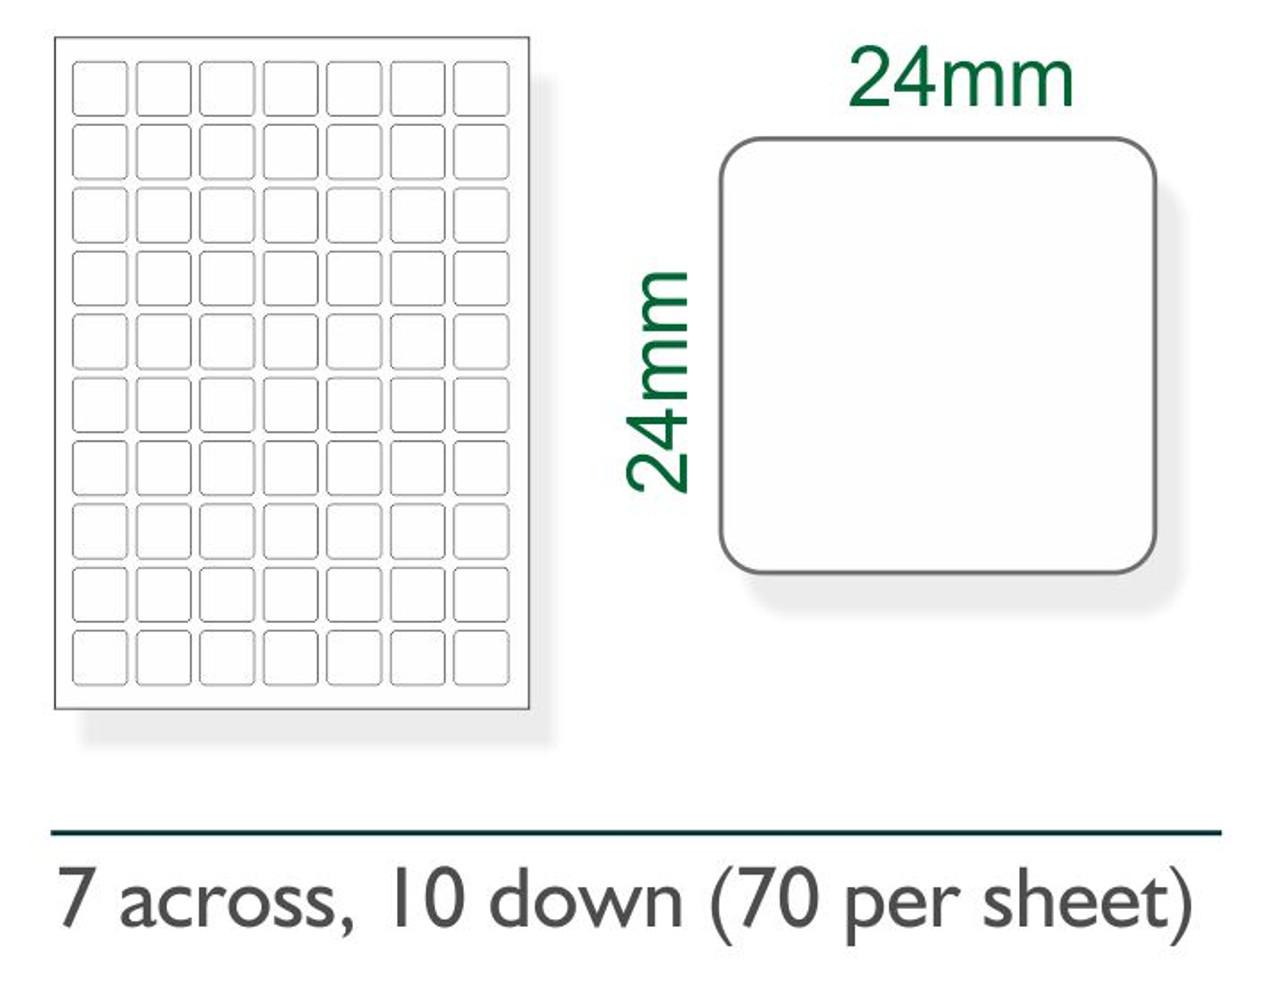 24mm x 24mm labels